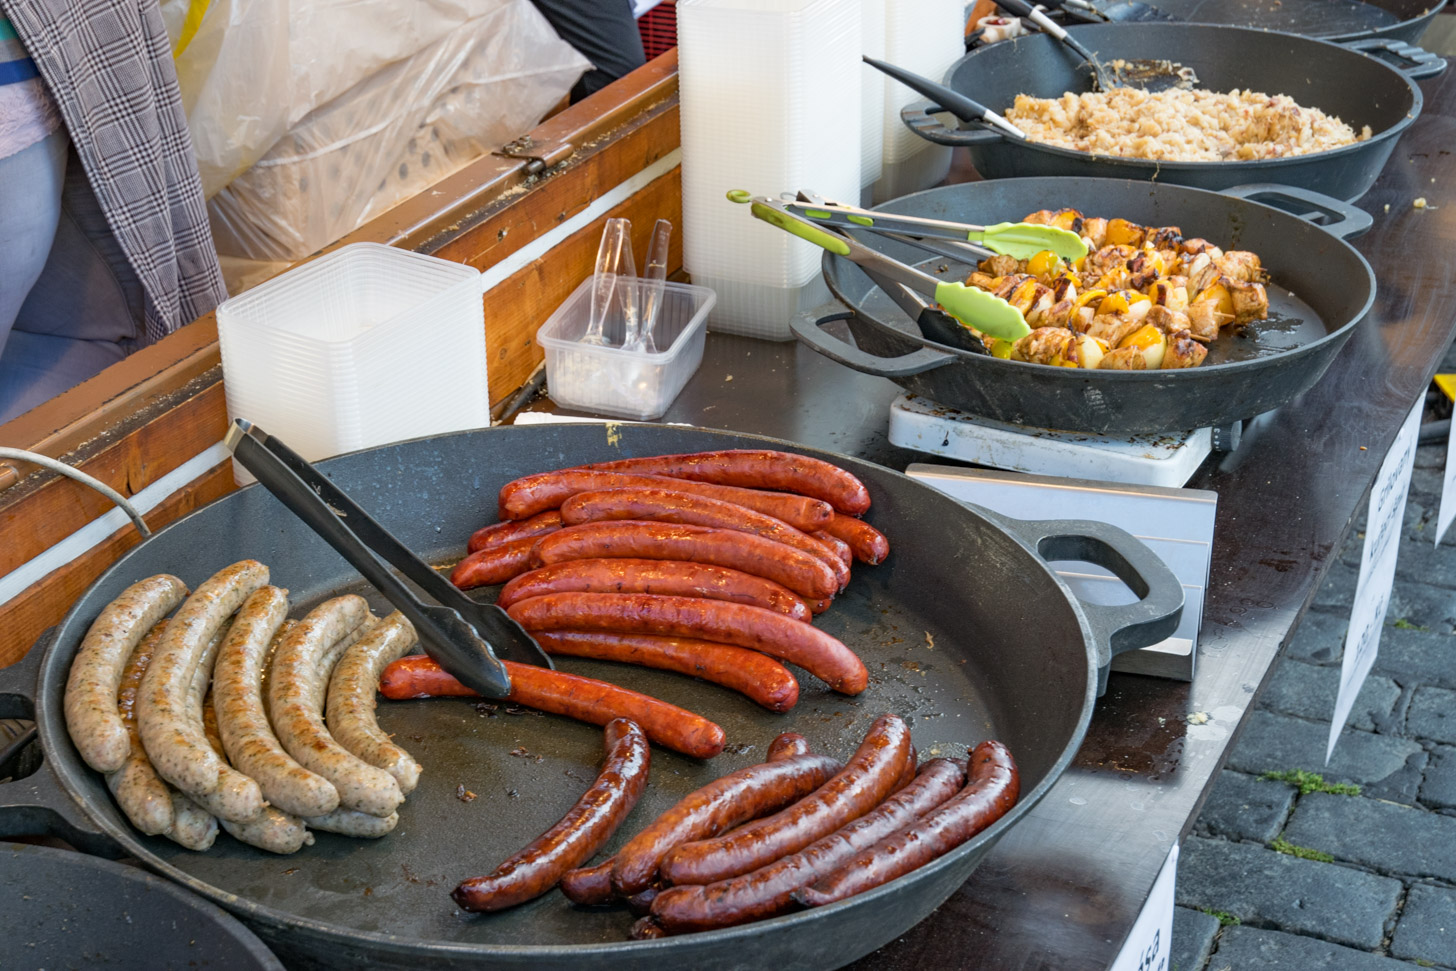 In Tsjechië eet men vooral veel vlees